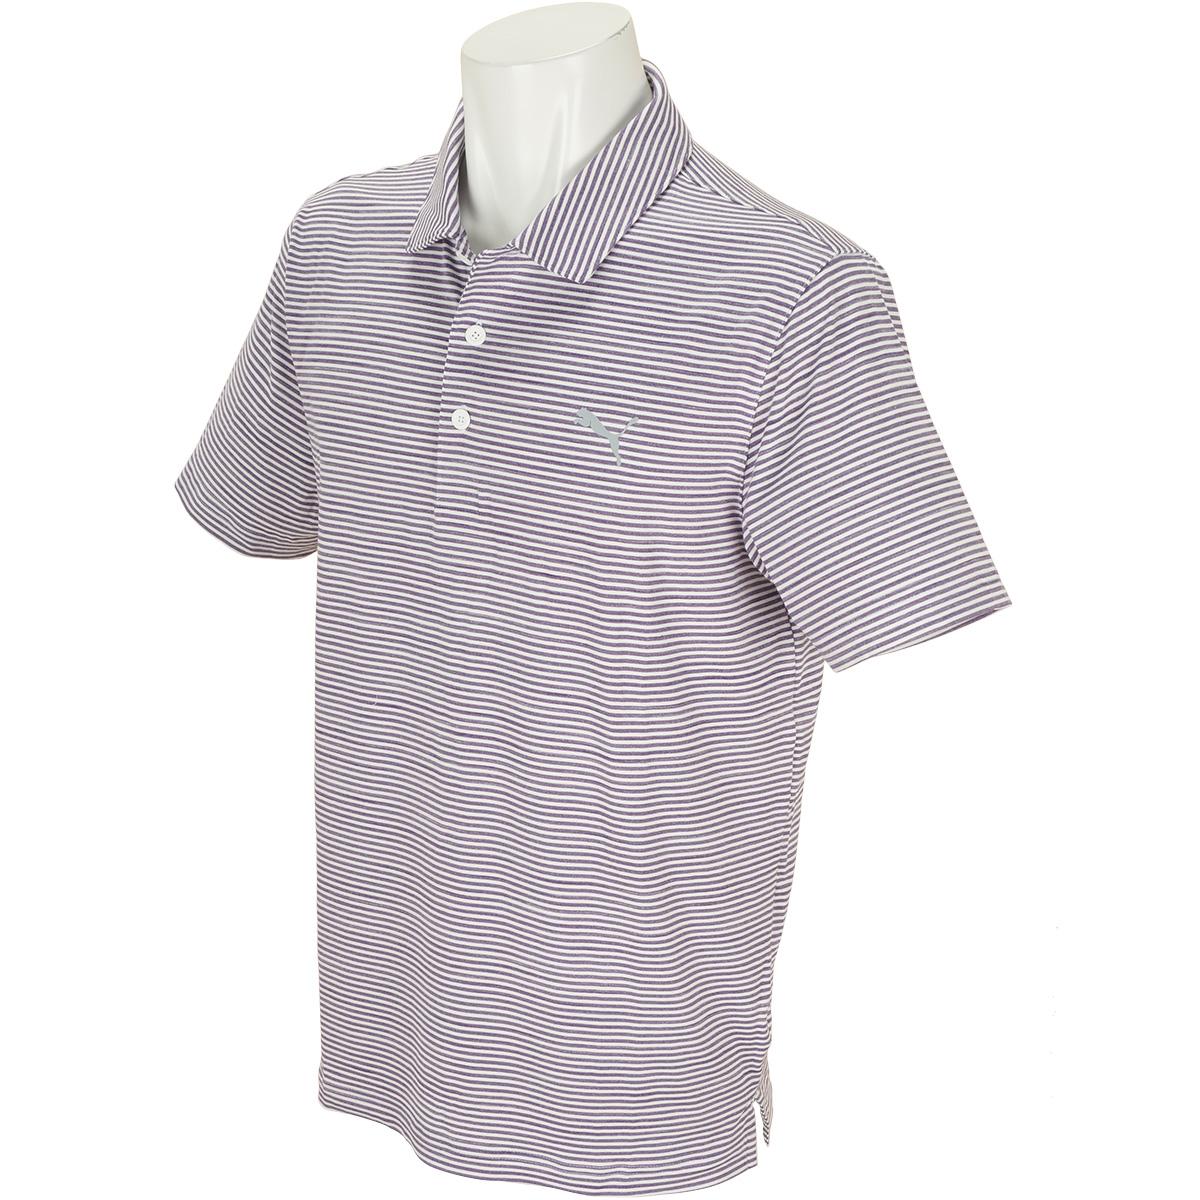 GDO限定 キャディ ストライプ 半袖ポロシャツ